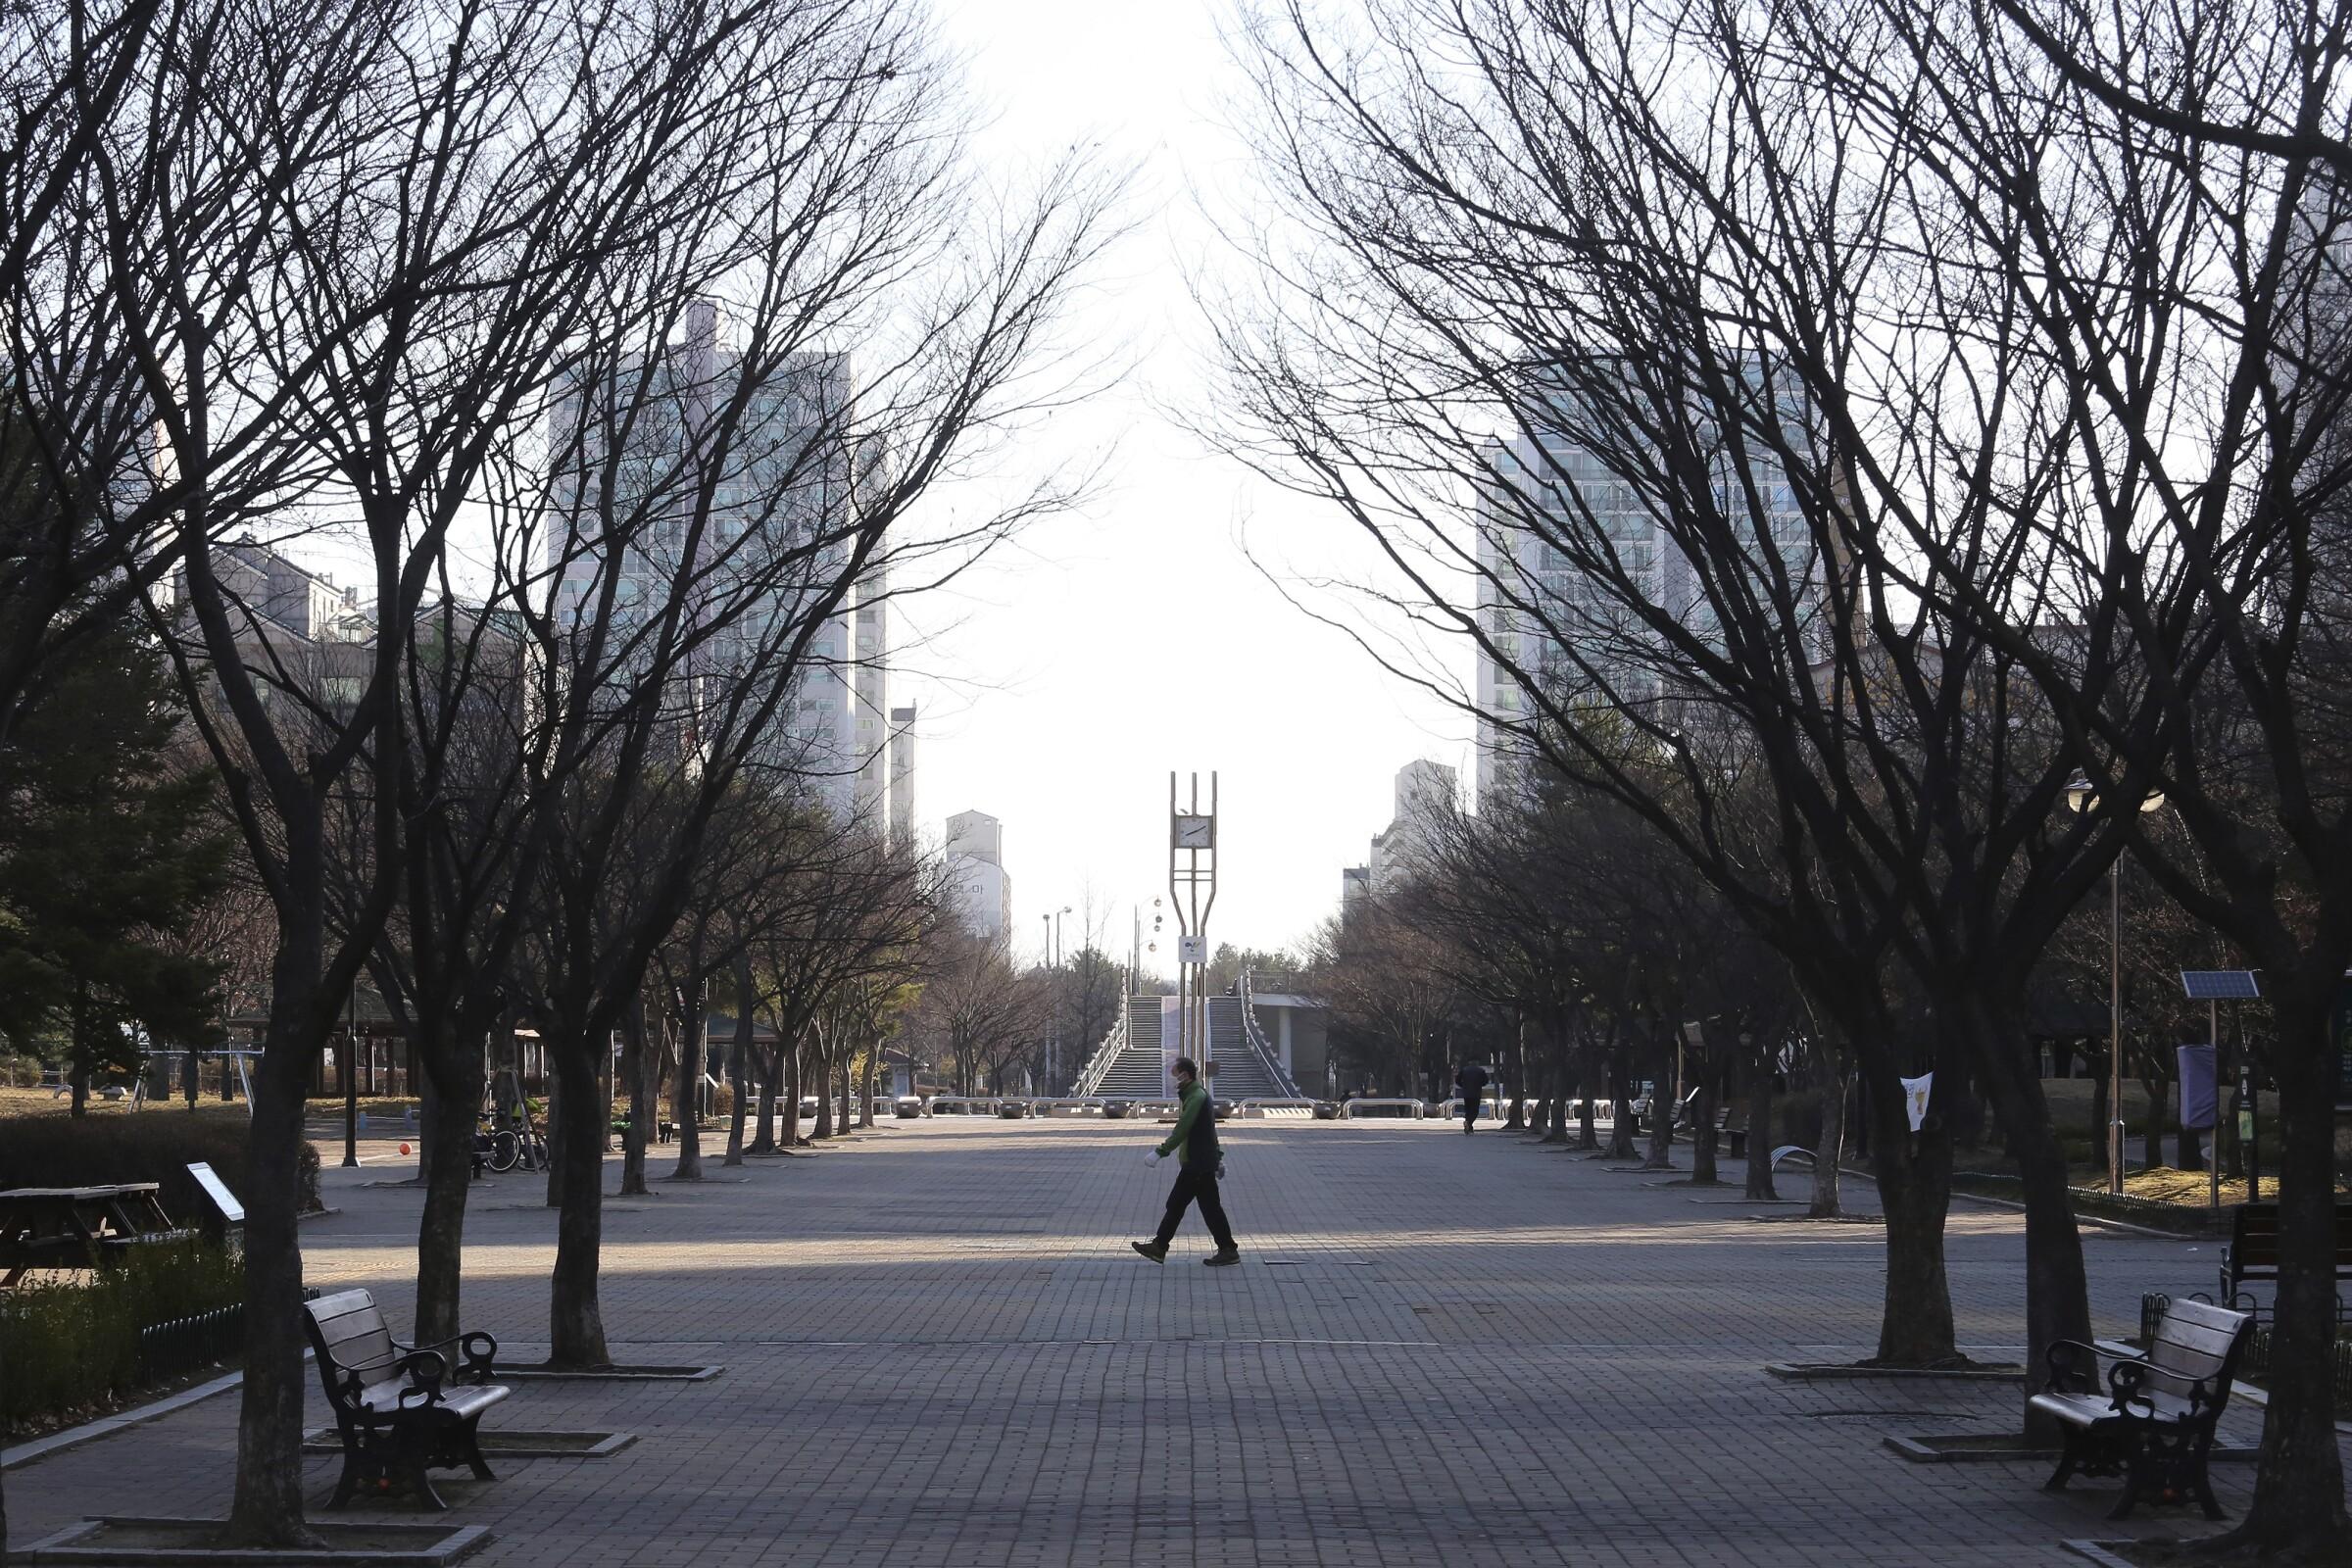 A man walks in a nearly empty park in South Korea